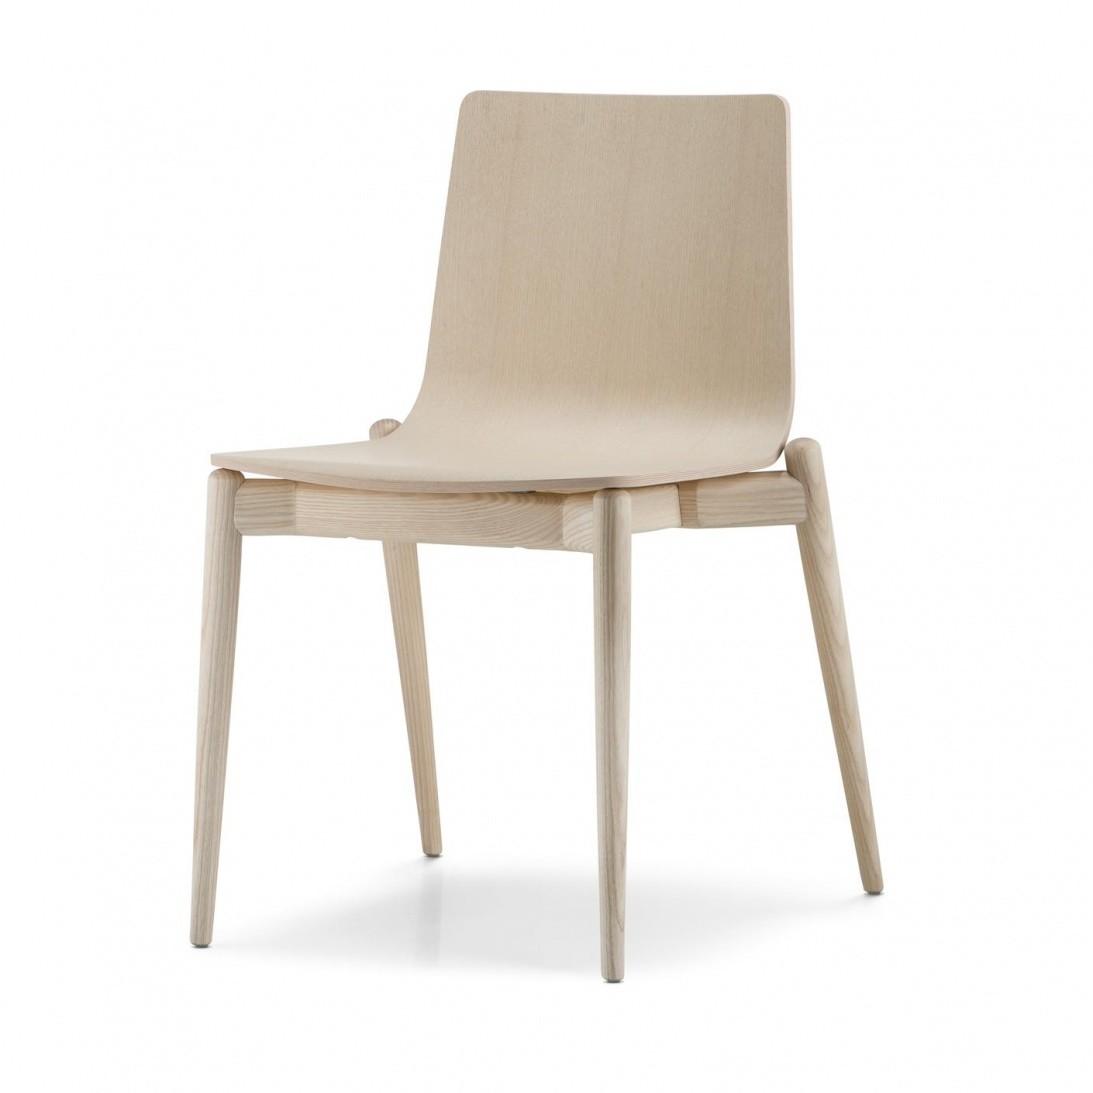 malm 390 chair pedrali. Black Bedroom Furniture Sets. Home Design Ideas